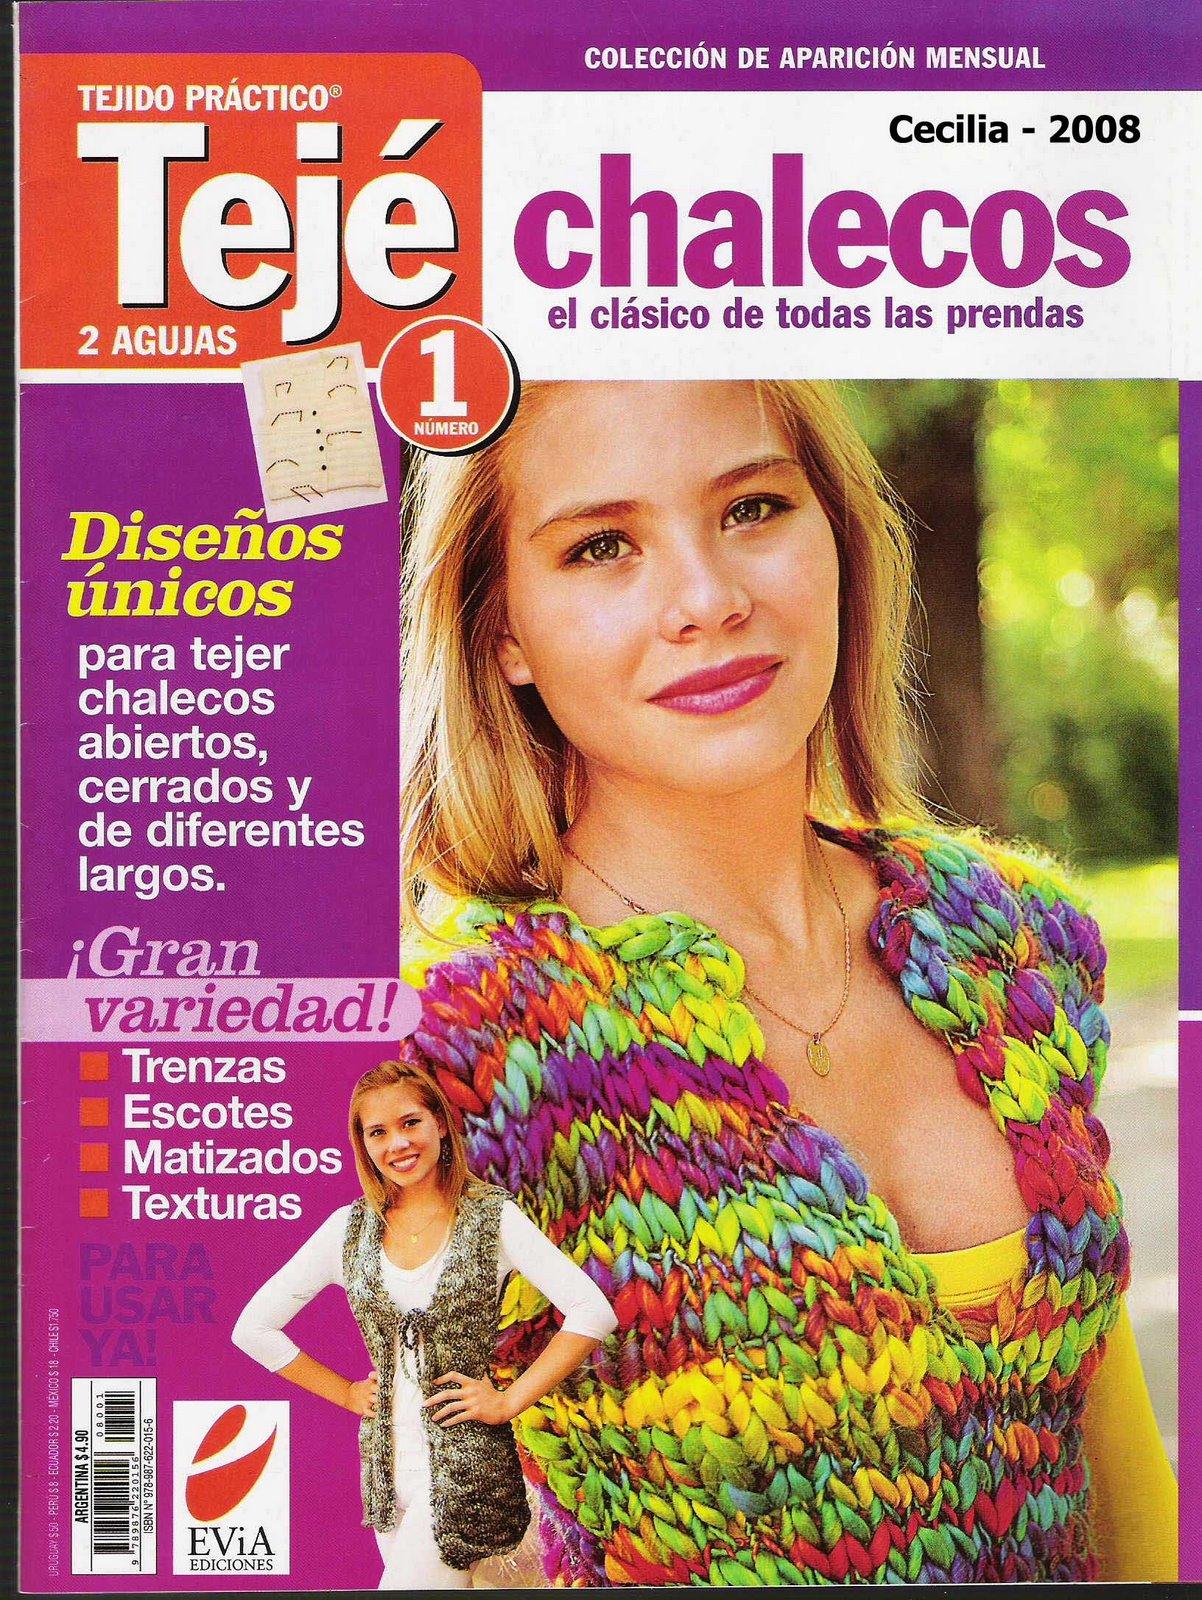 Revista  Tejido Practico 2 agujas - Especial Chalecos - Revistas ... 869922e5c401